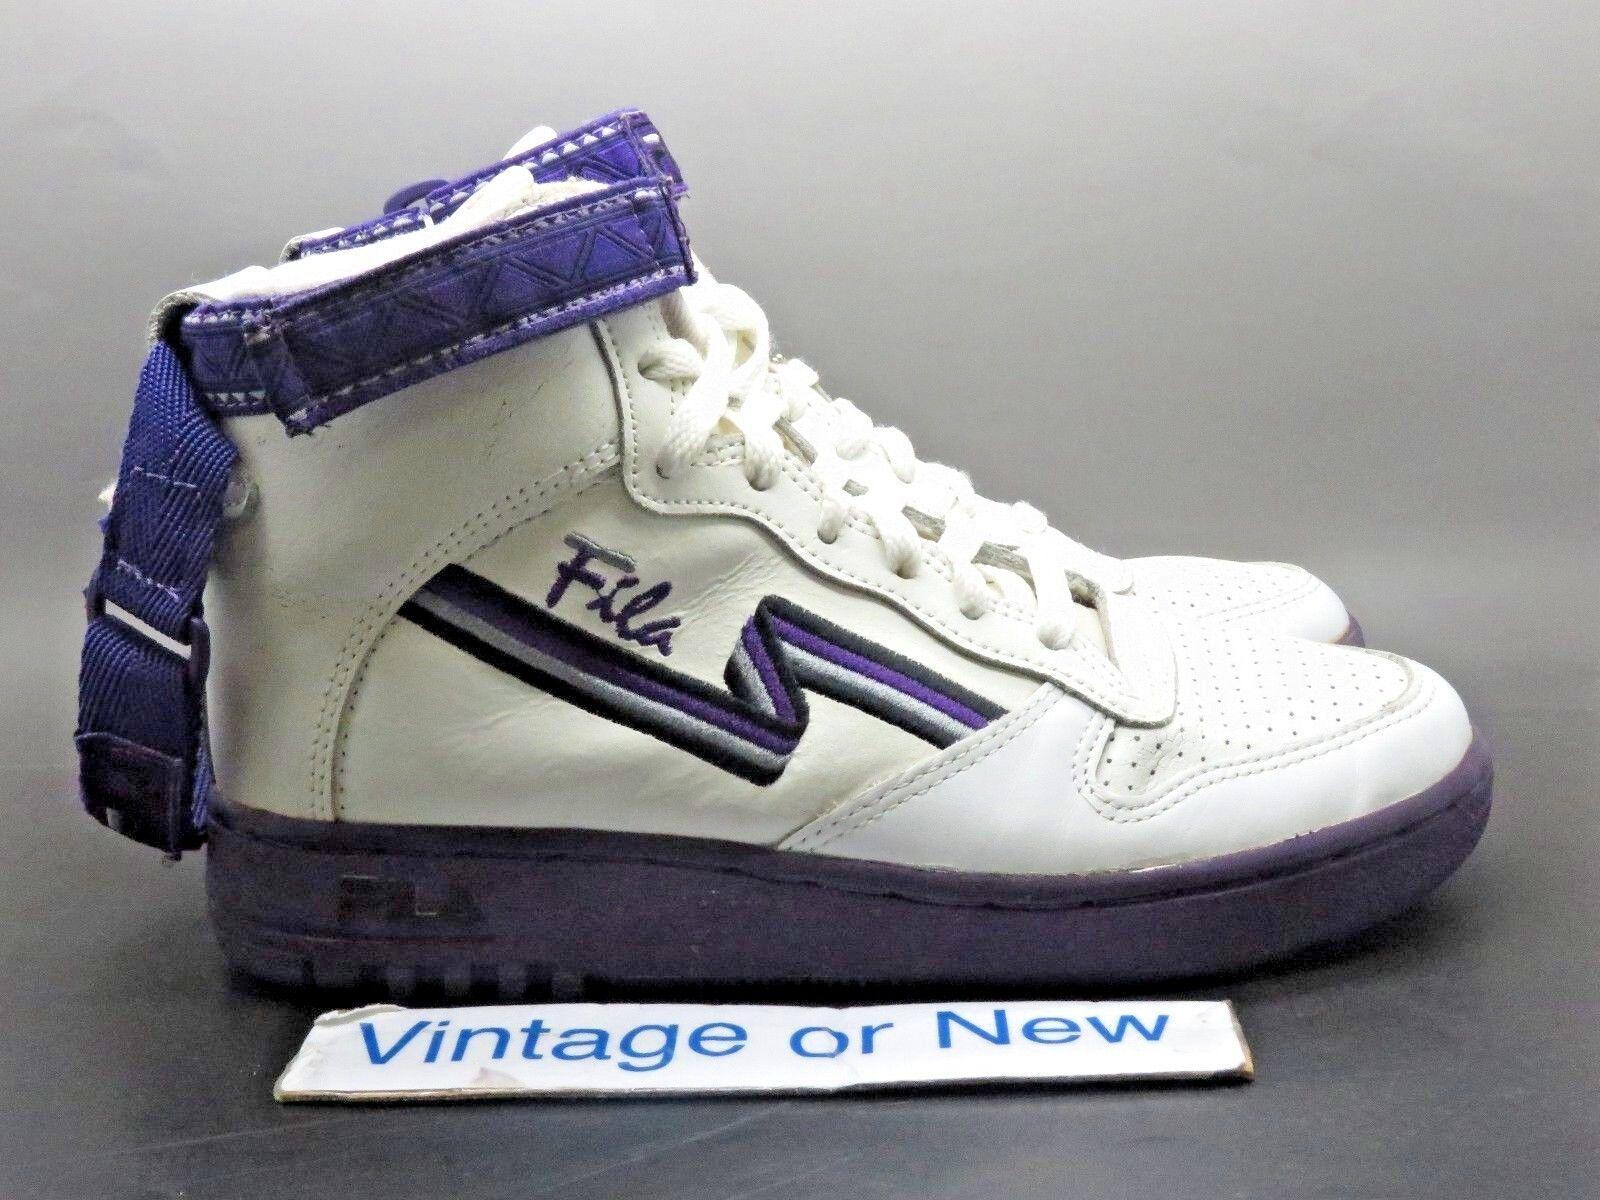 Women's VTG 1992 Fila FX-100 White Purple Double Strap Hi Top Sneakers Price reduction Seasonal clearance sale